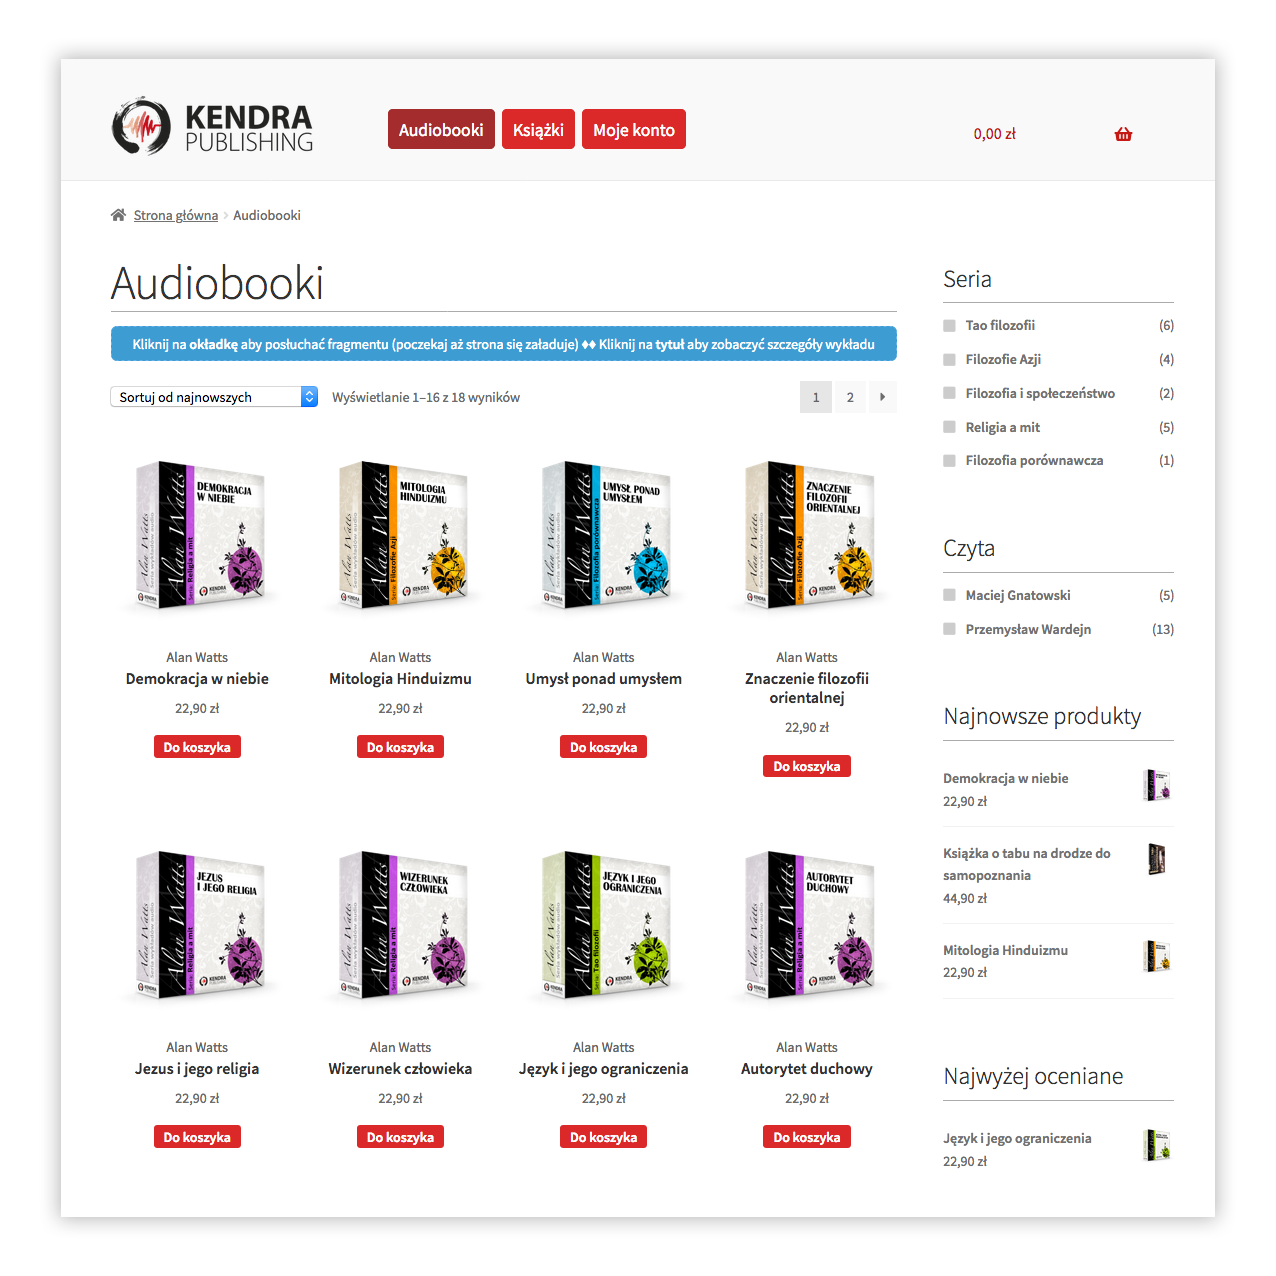 Sklep Kendra Publishing